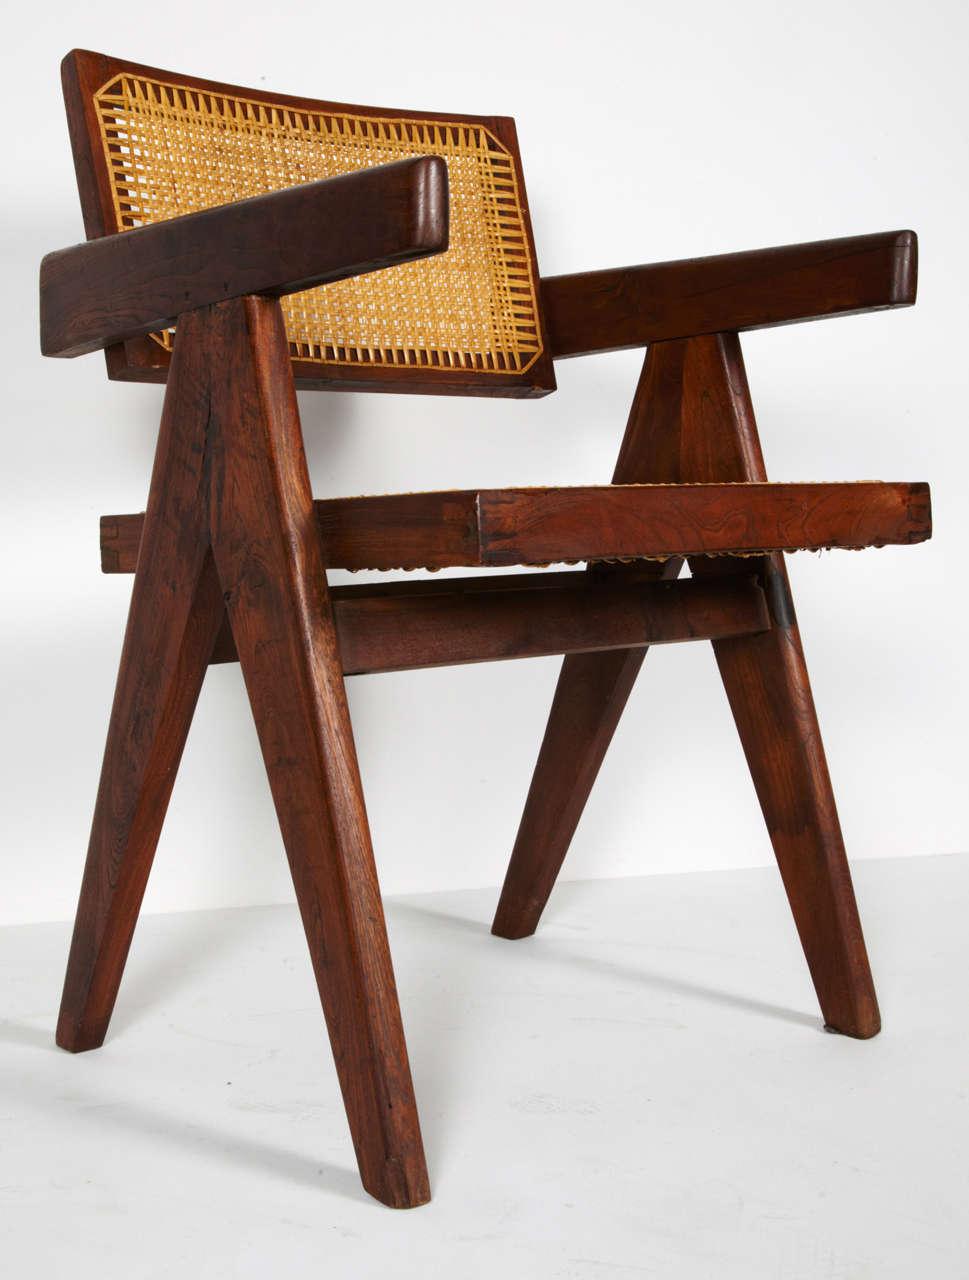 Pierre Jeanneret, Office Chair, circa 1955 9